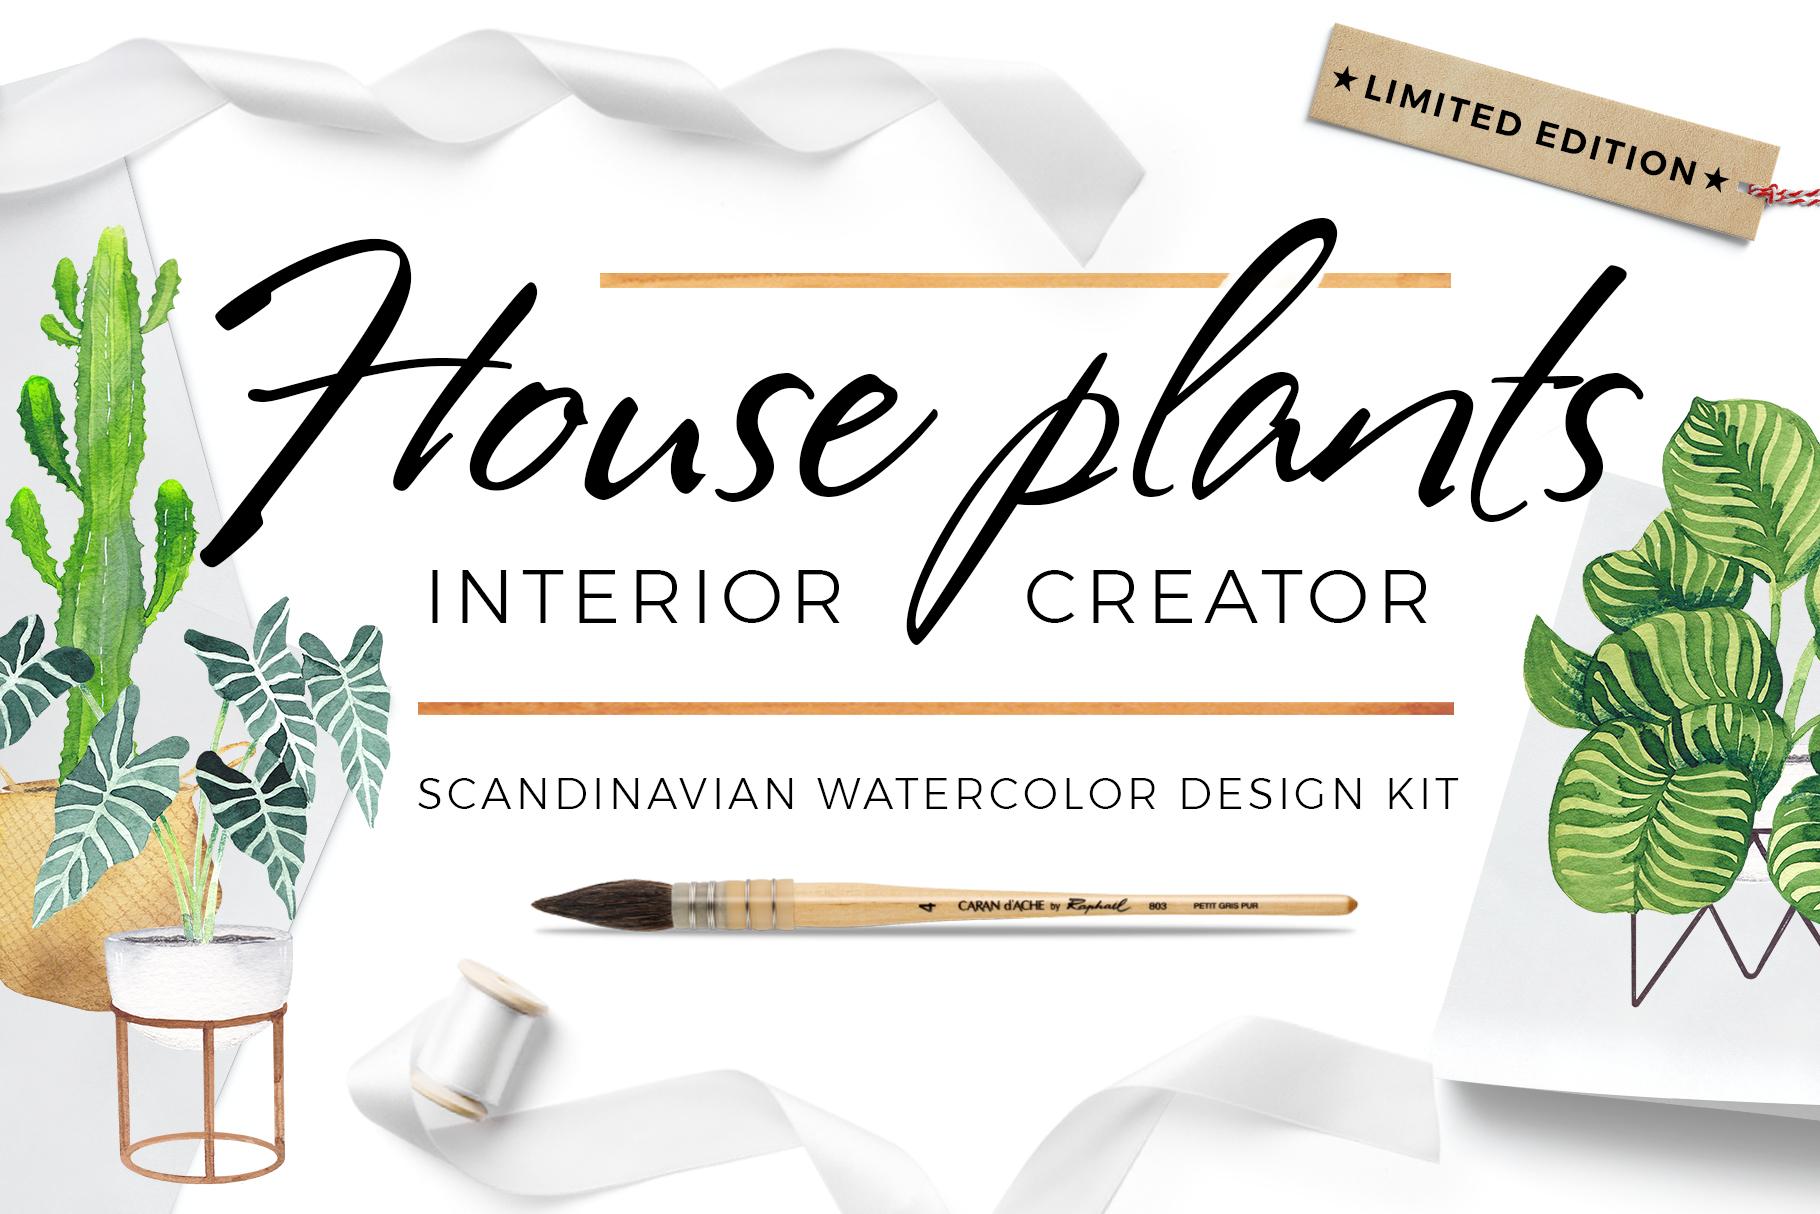 Scandi house plants interior creator example image 1